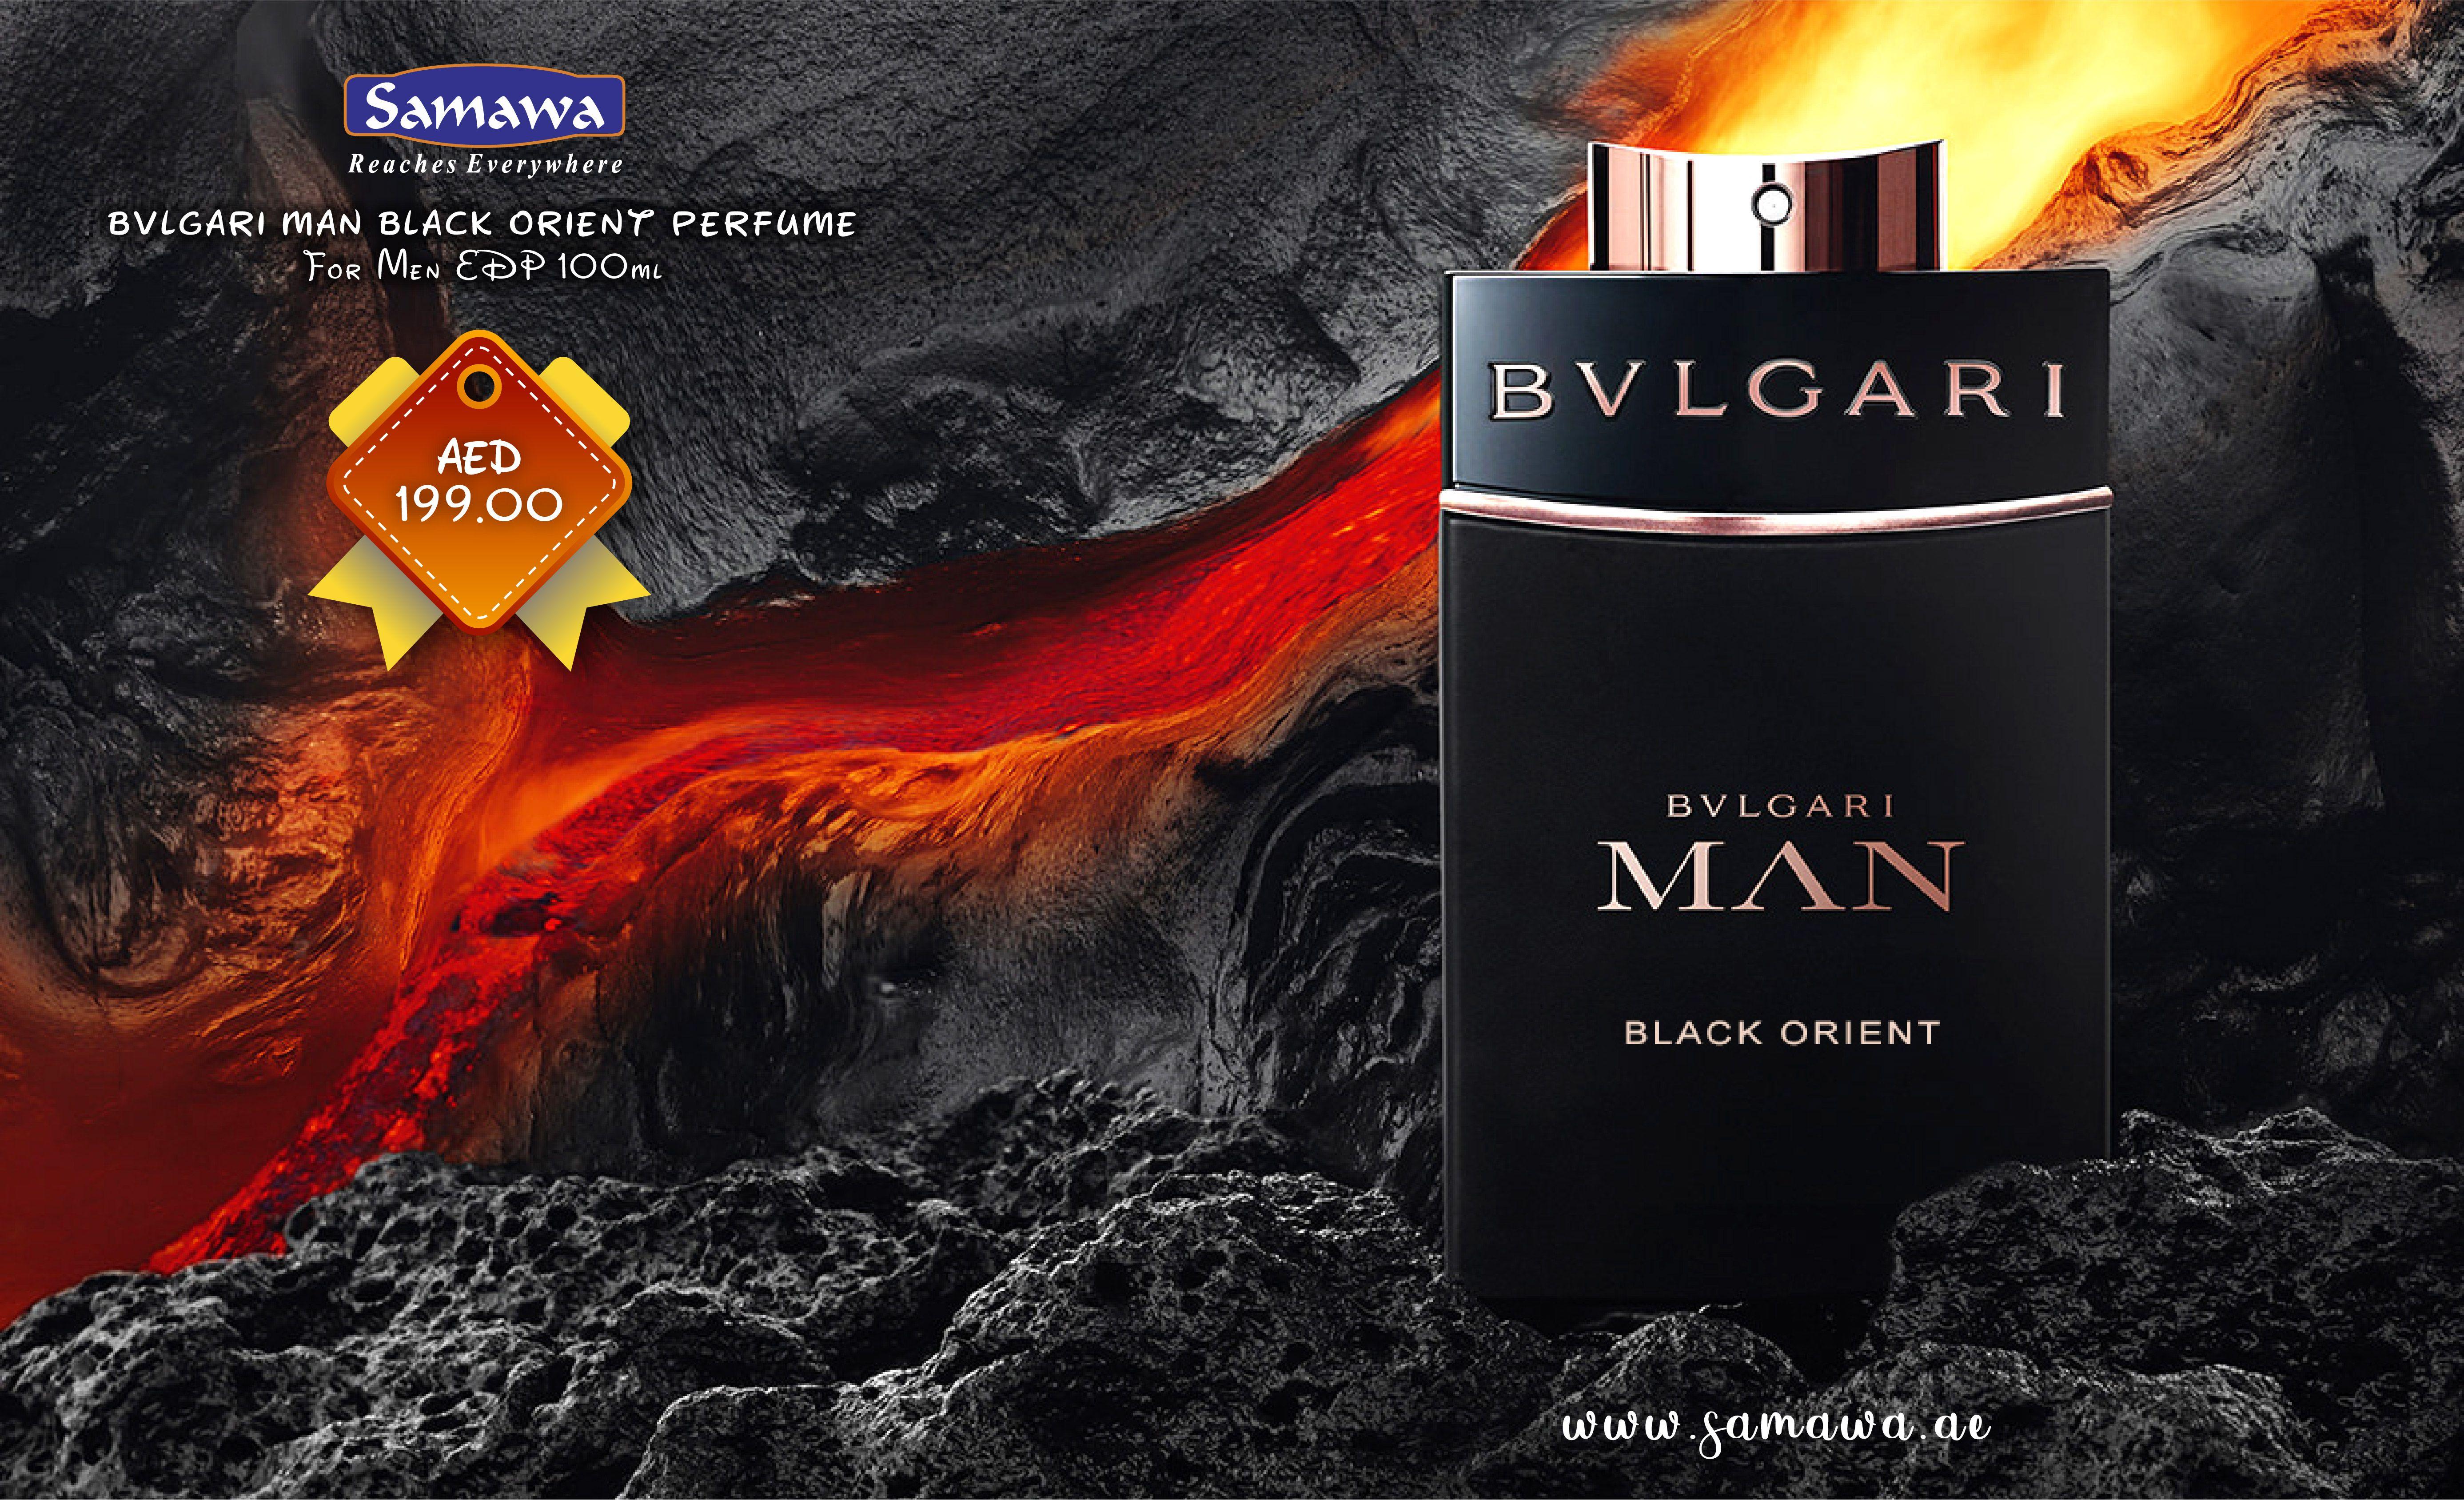 287d65656d4 Bvlgari Man Black Orient Perfume For Men EDP 100ml FOr Only 199AED  dubai   dubaiuae  dubaitag  dubaideals  sale  shoponline  Perfume